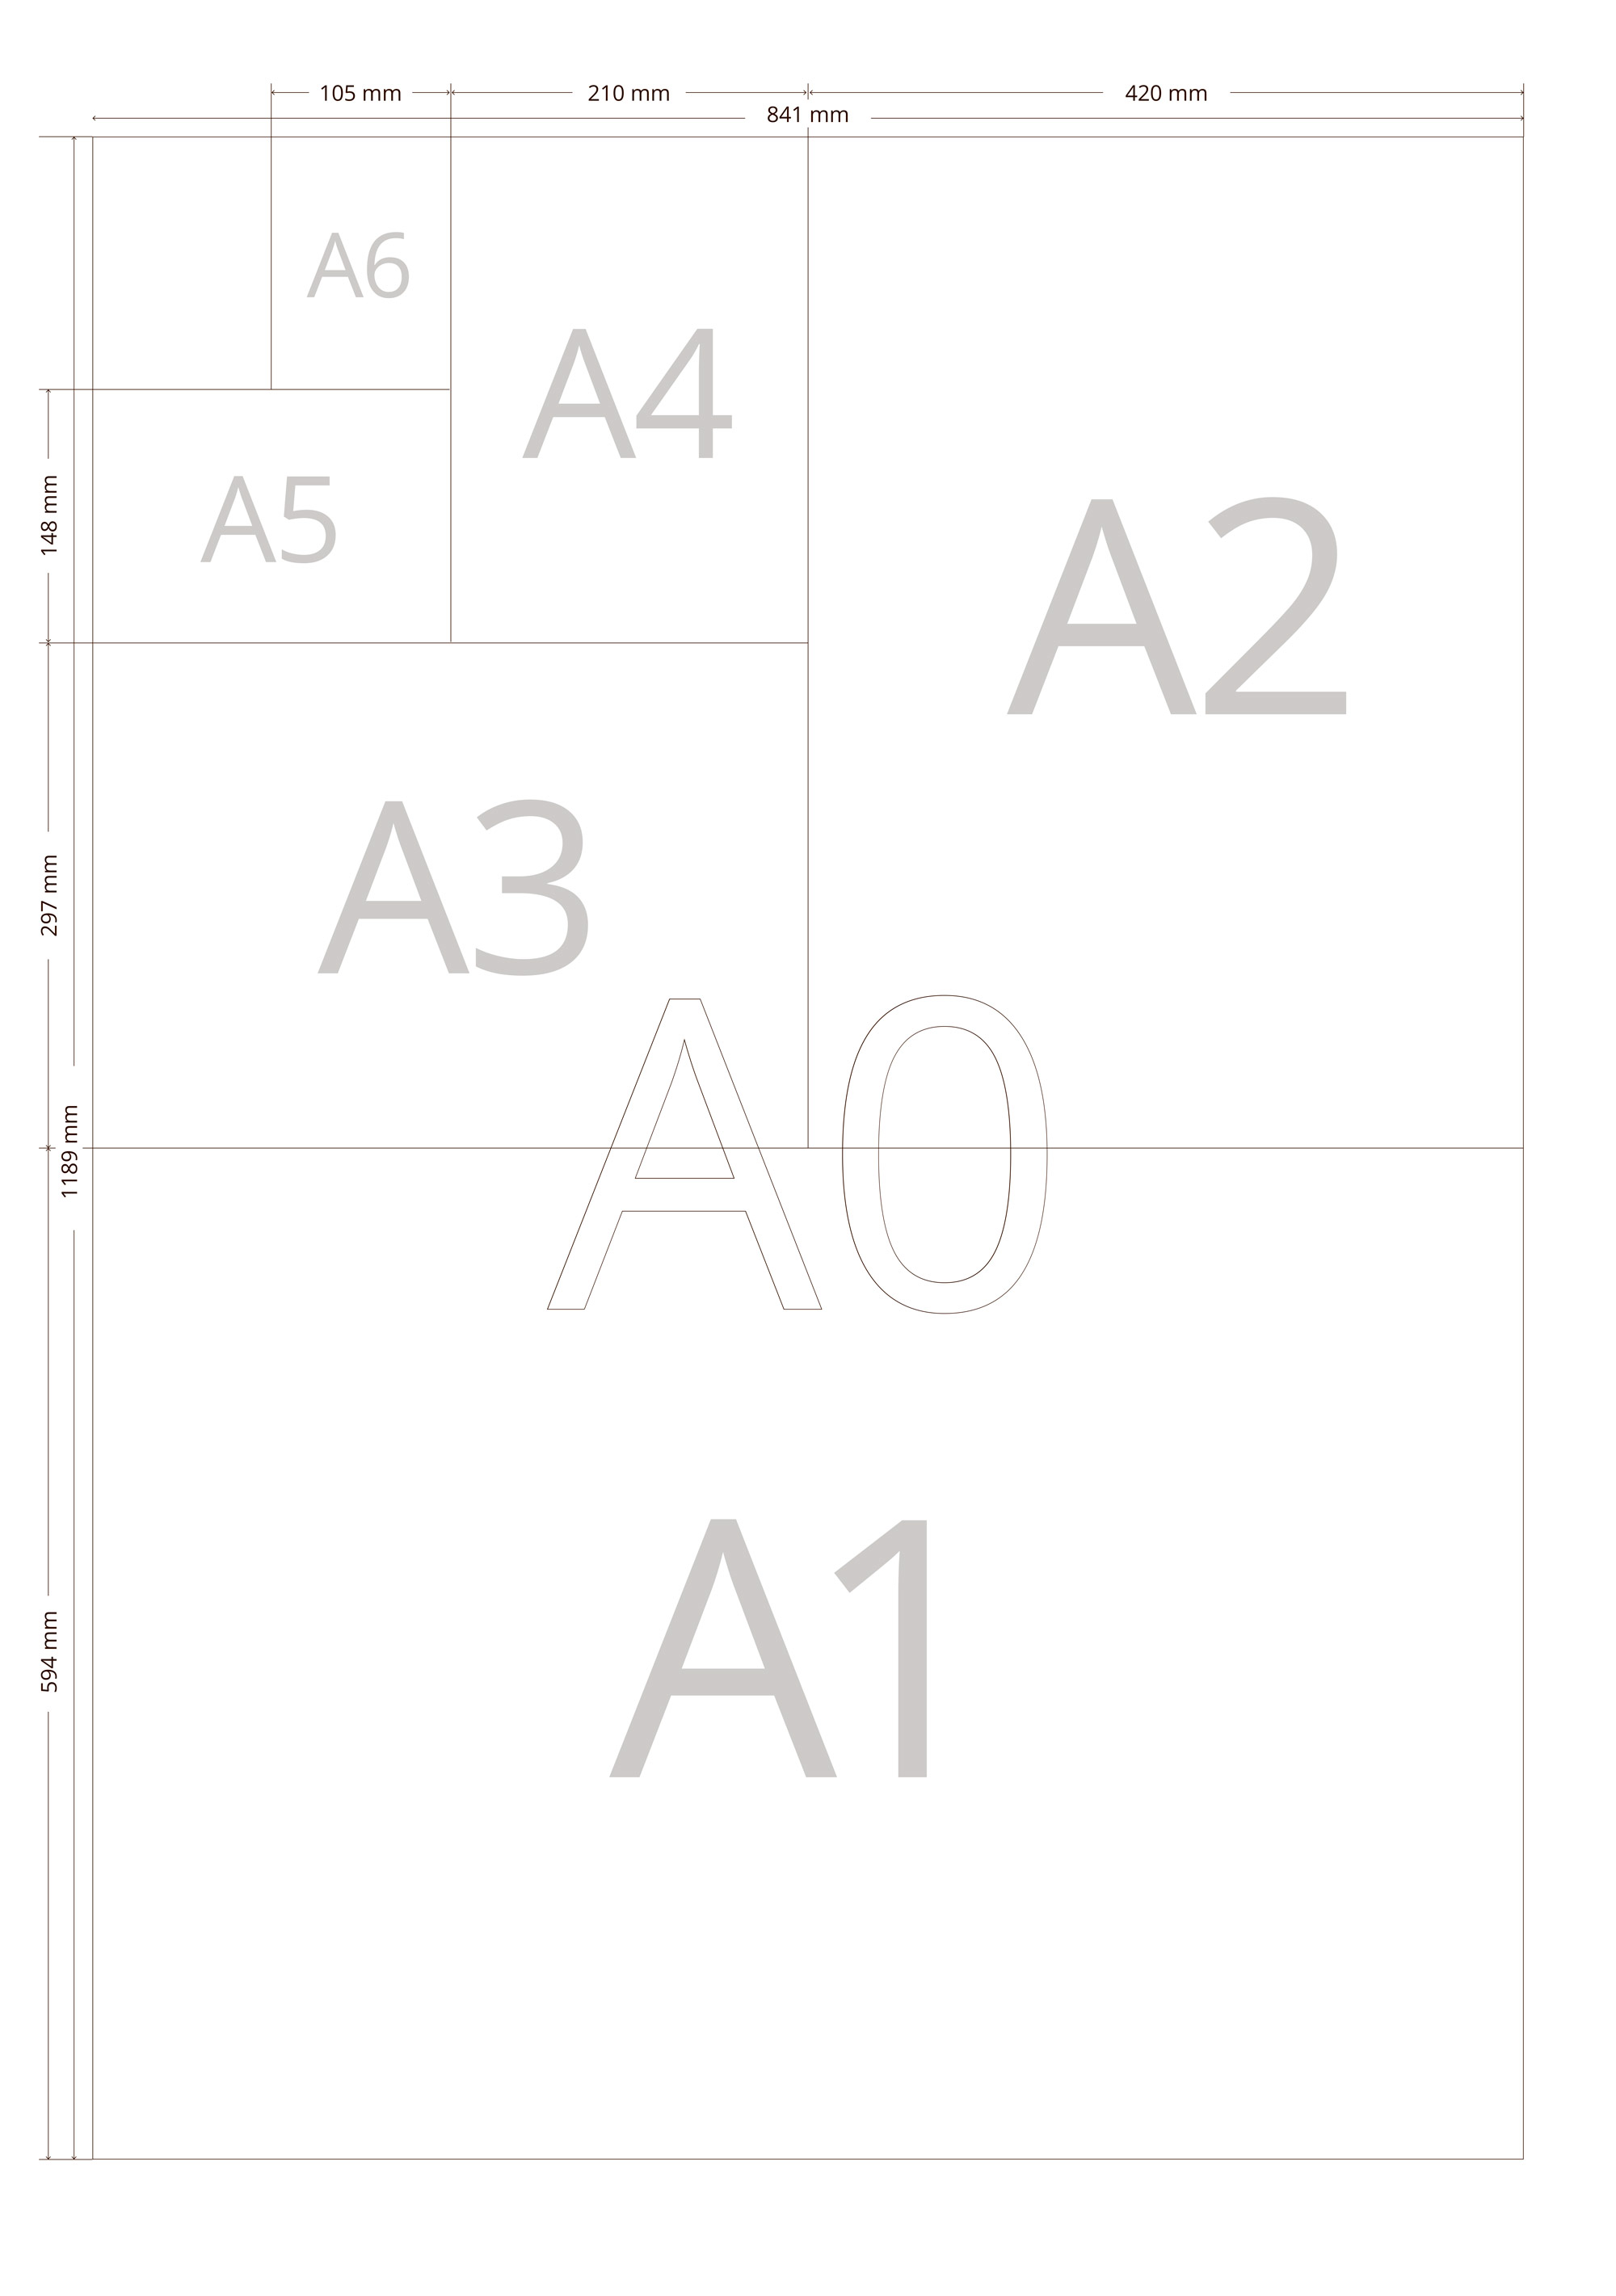 ab583985 Papirstørrelser? Få styr på målene på A3, A4, A5 mfl.